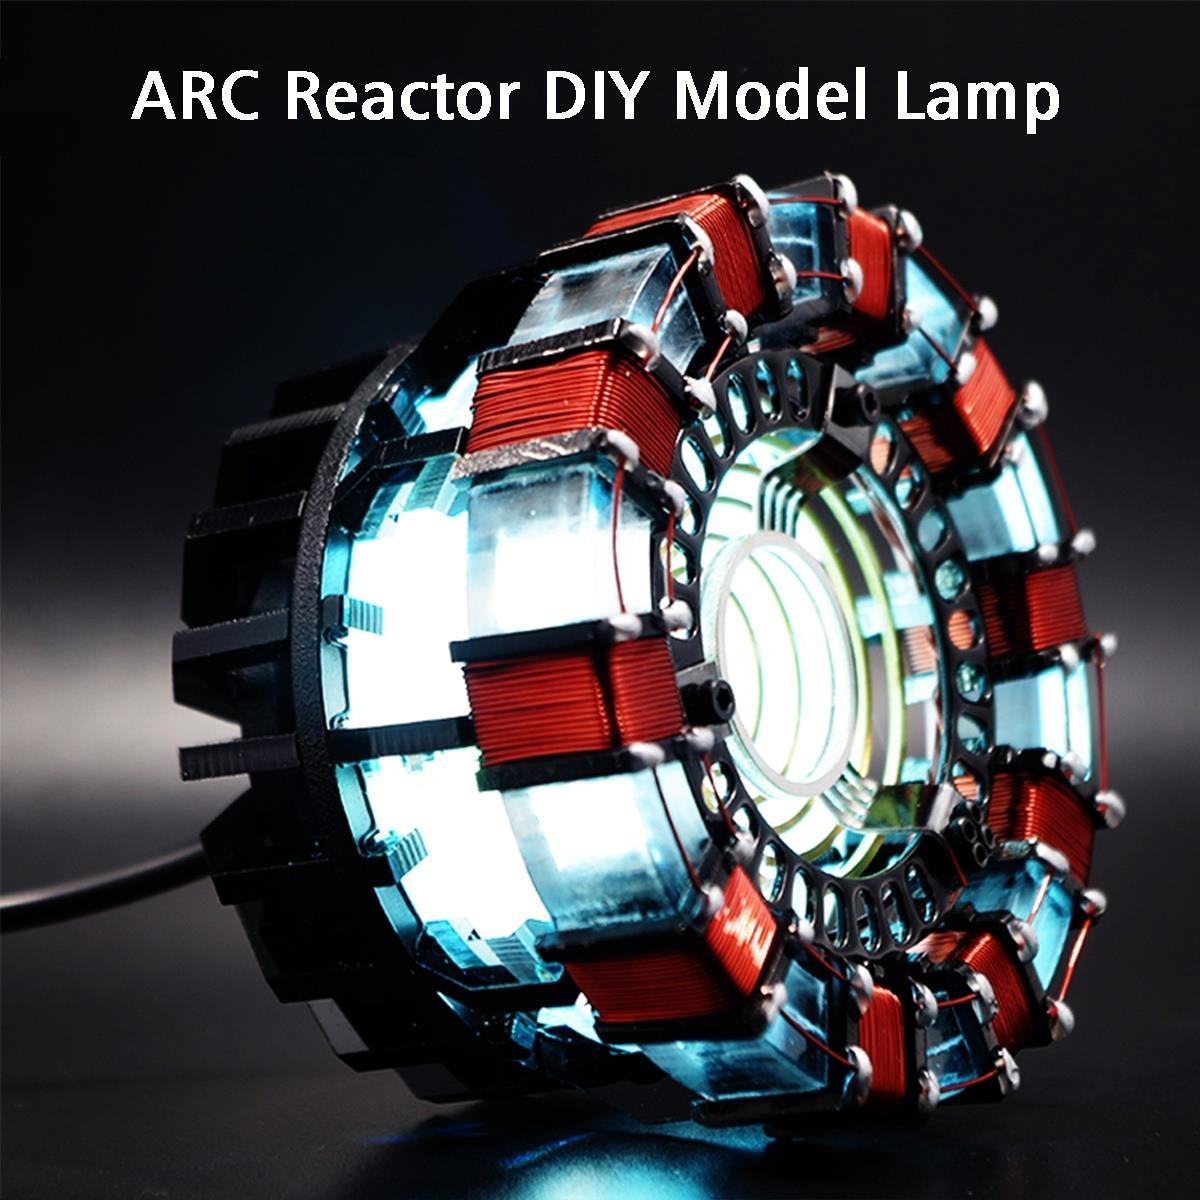 MK1 Acrylic Remote Ver. Tony DIY Arc Reactor Lamp Kit Remote Control Illuminant LED Flash Light Heart Set